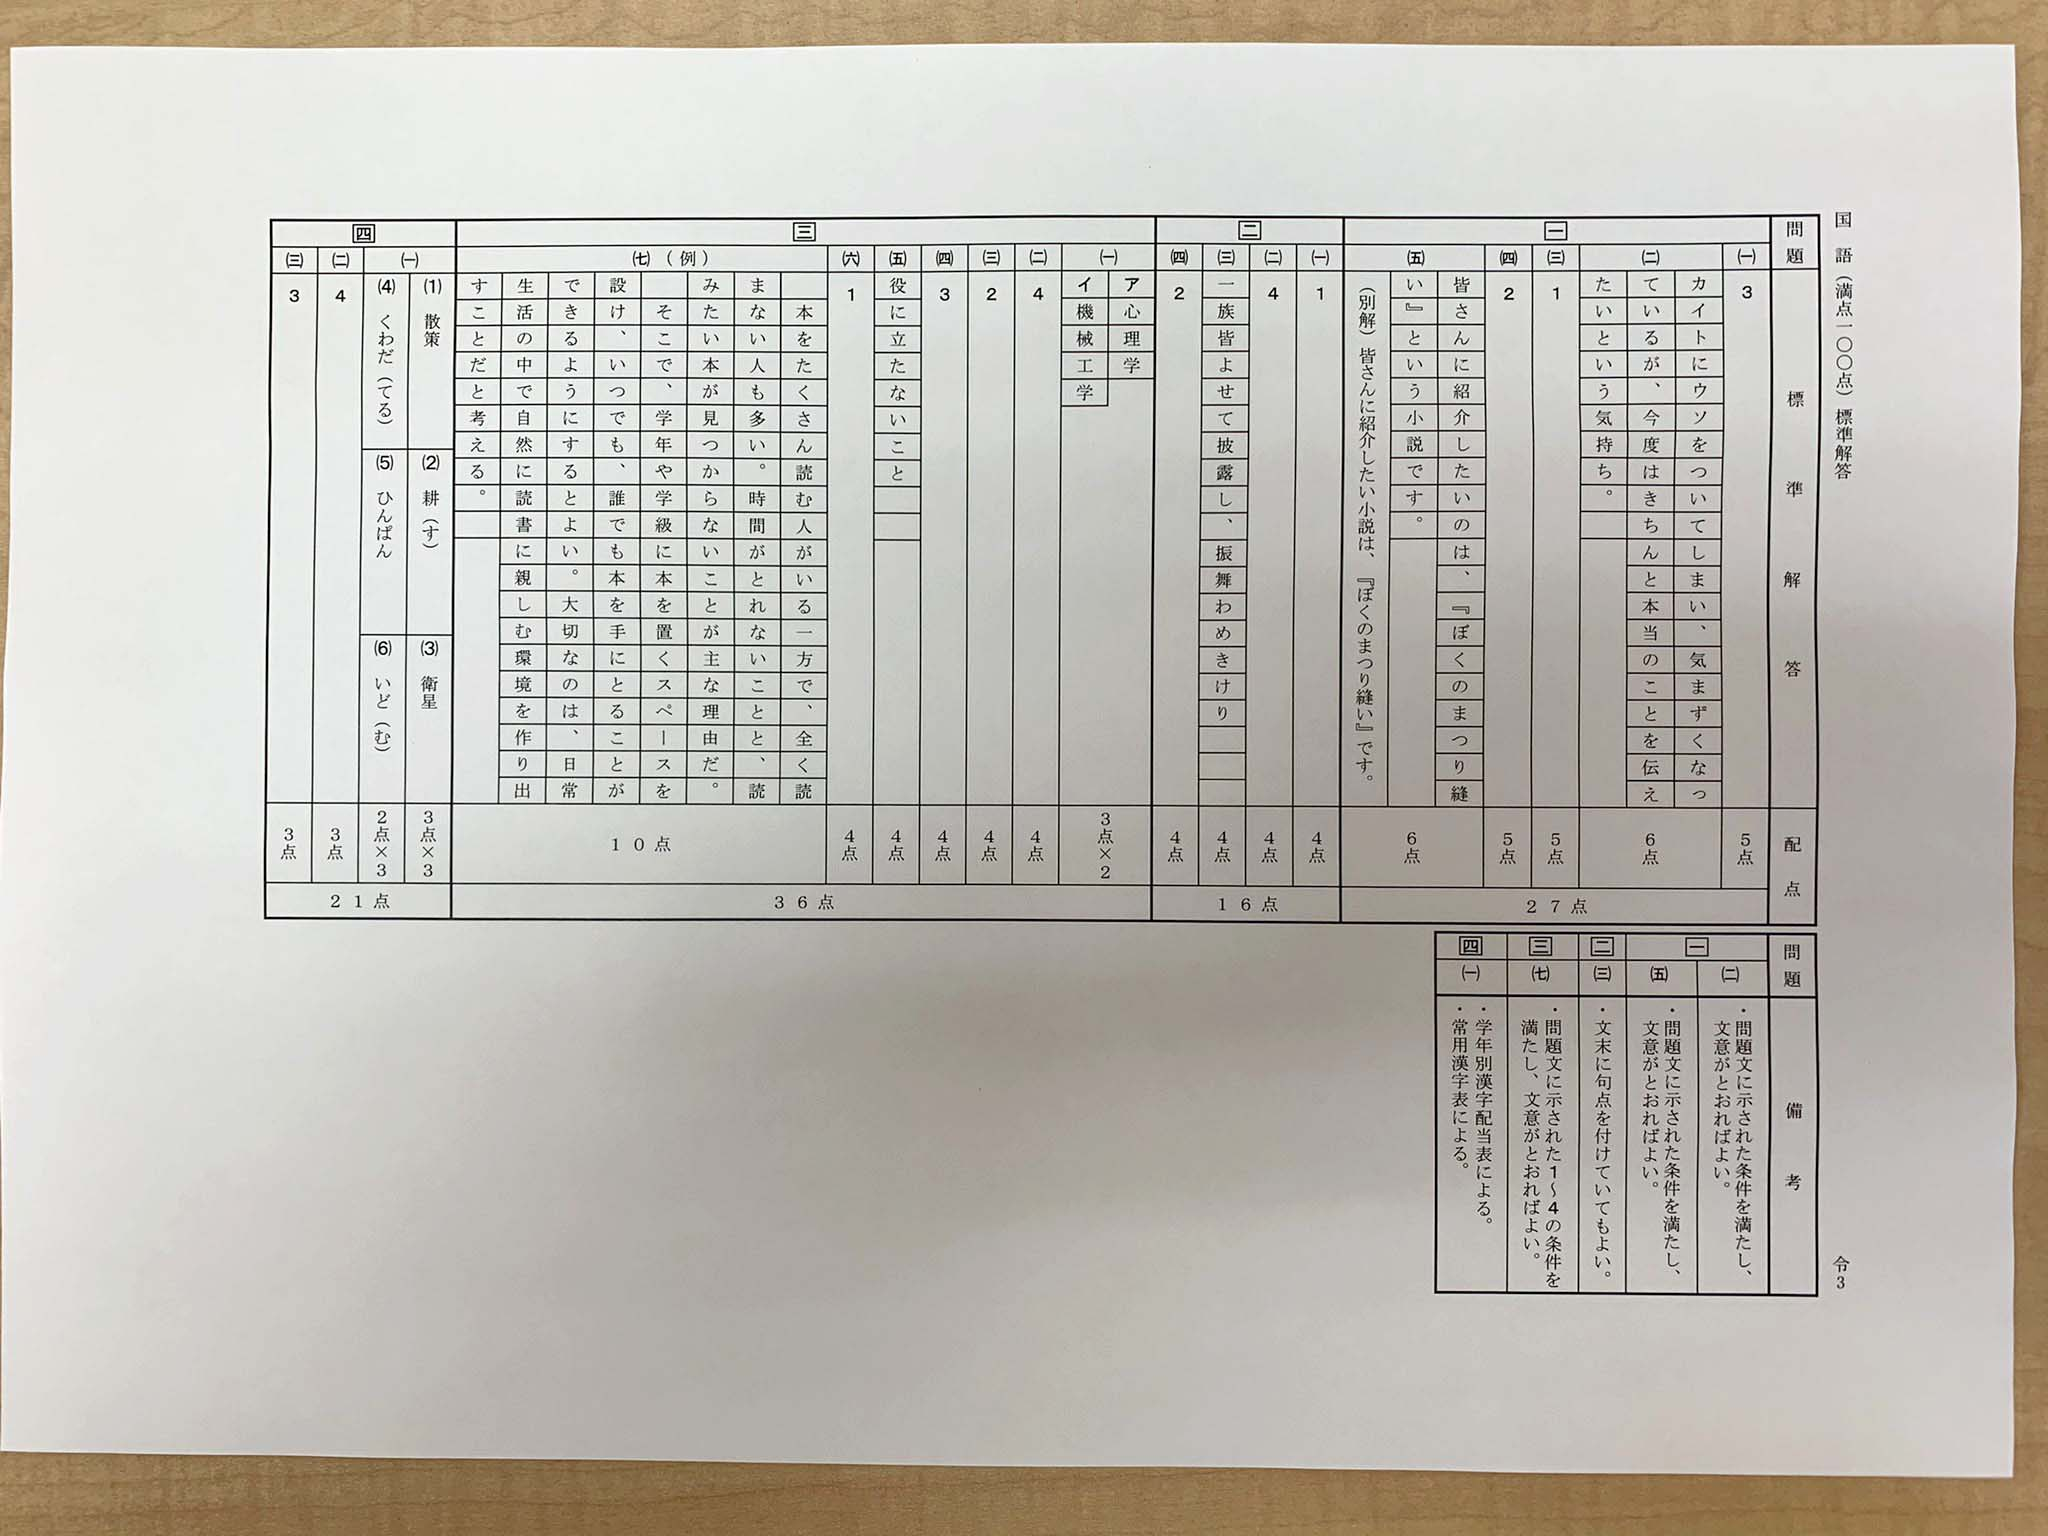 本日実施の茨城県立高入試、解答出ましたpage-visual 本日実施の茨城県立高入試、解答出ましたビジュアル